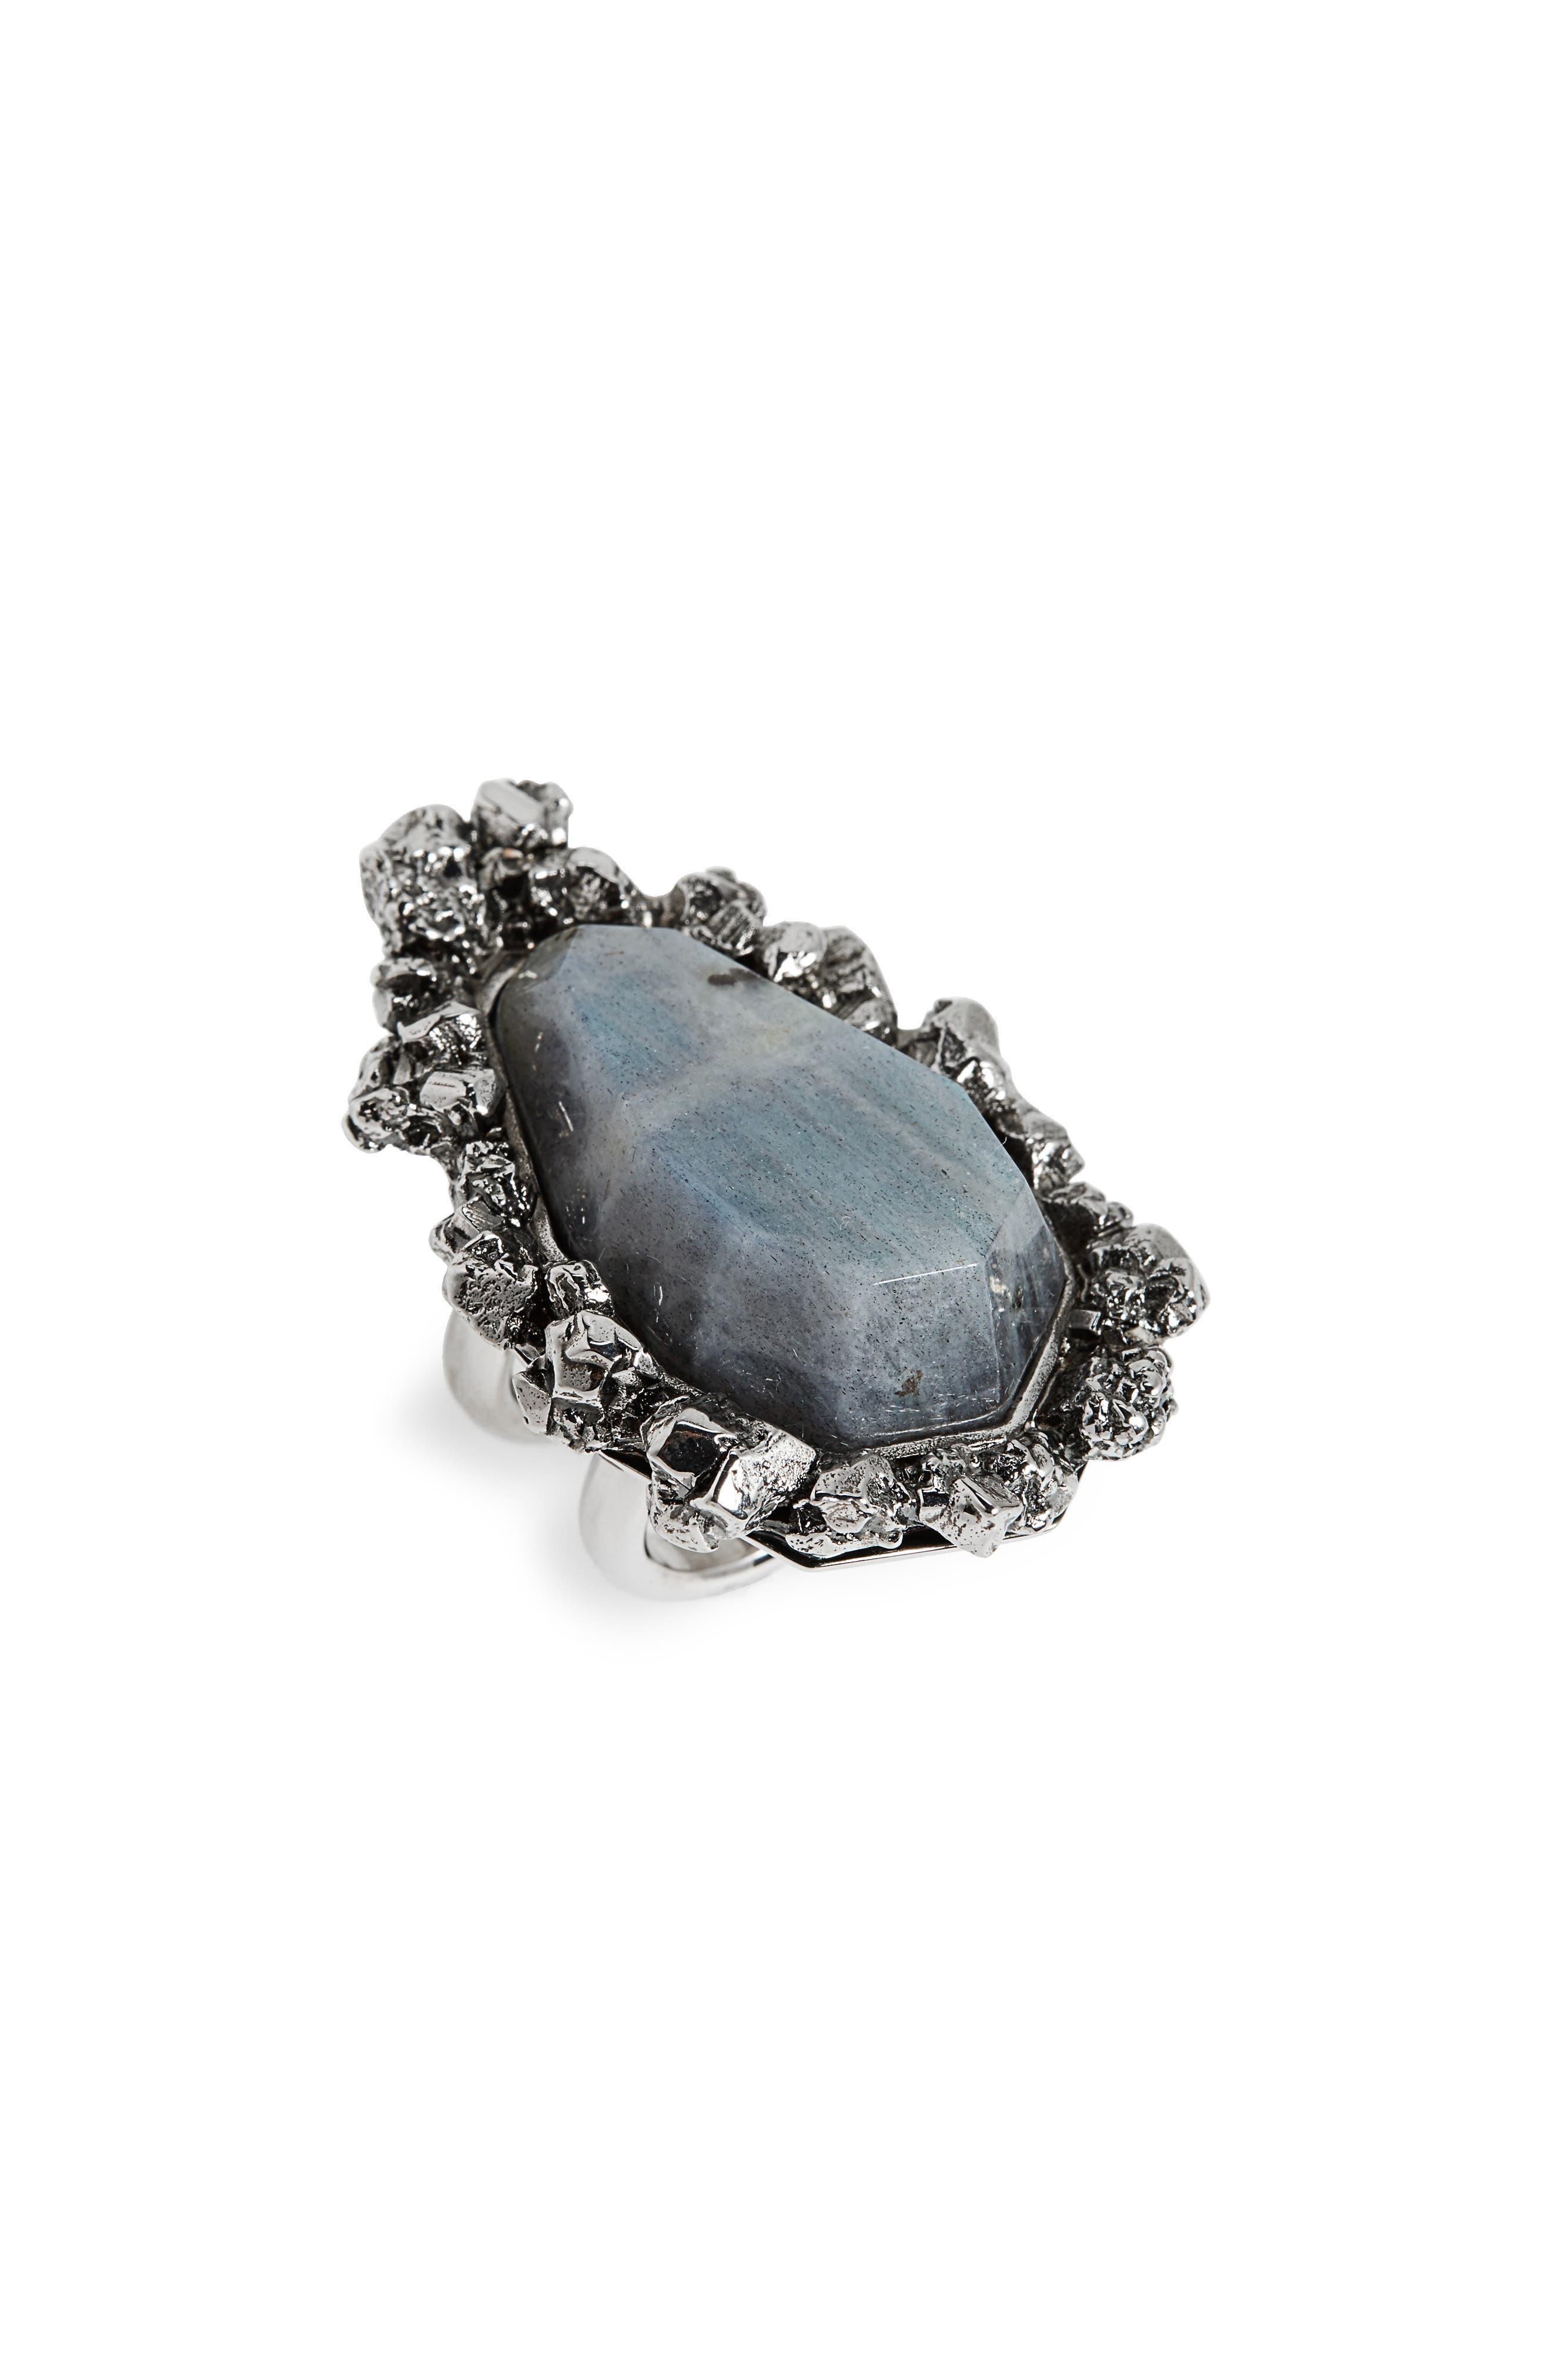 Main Image - Alexander McQueen Labradorite Ring